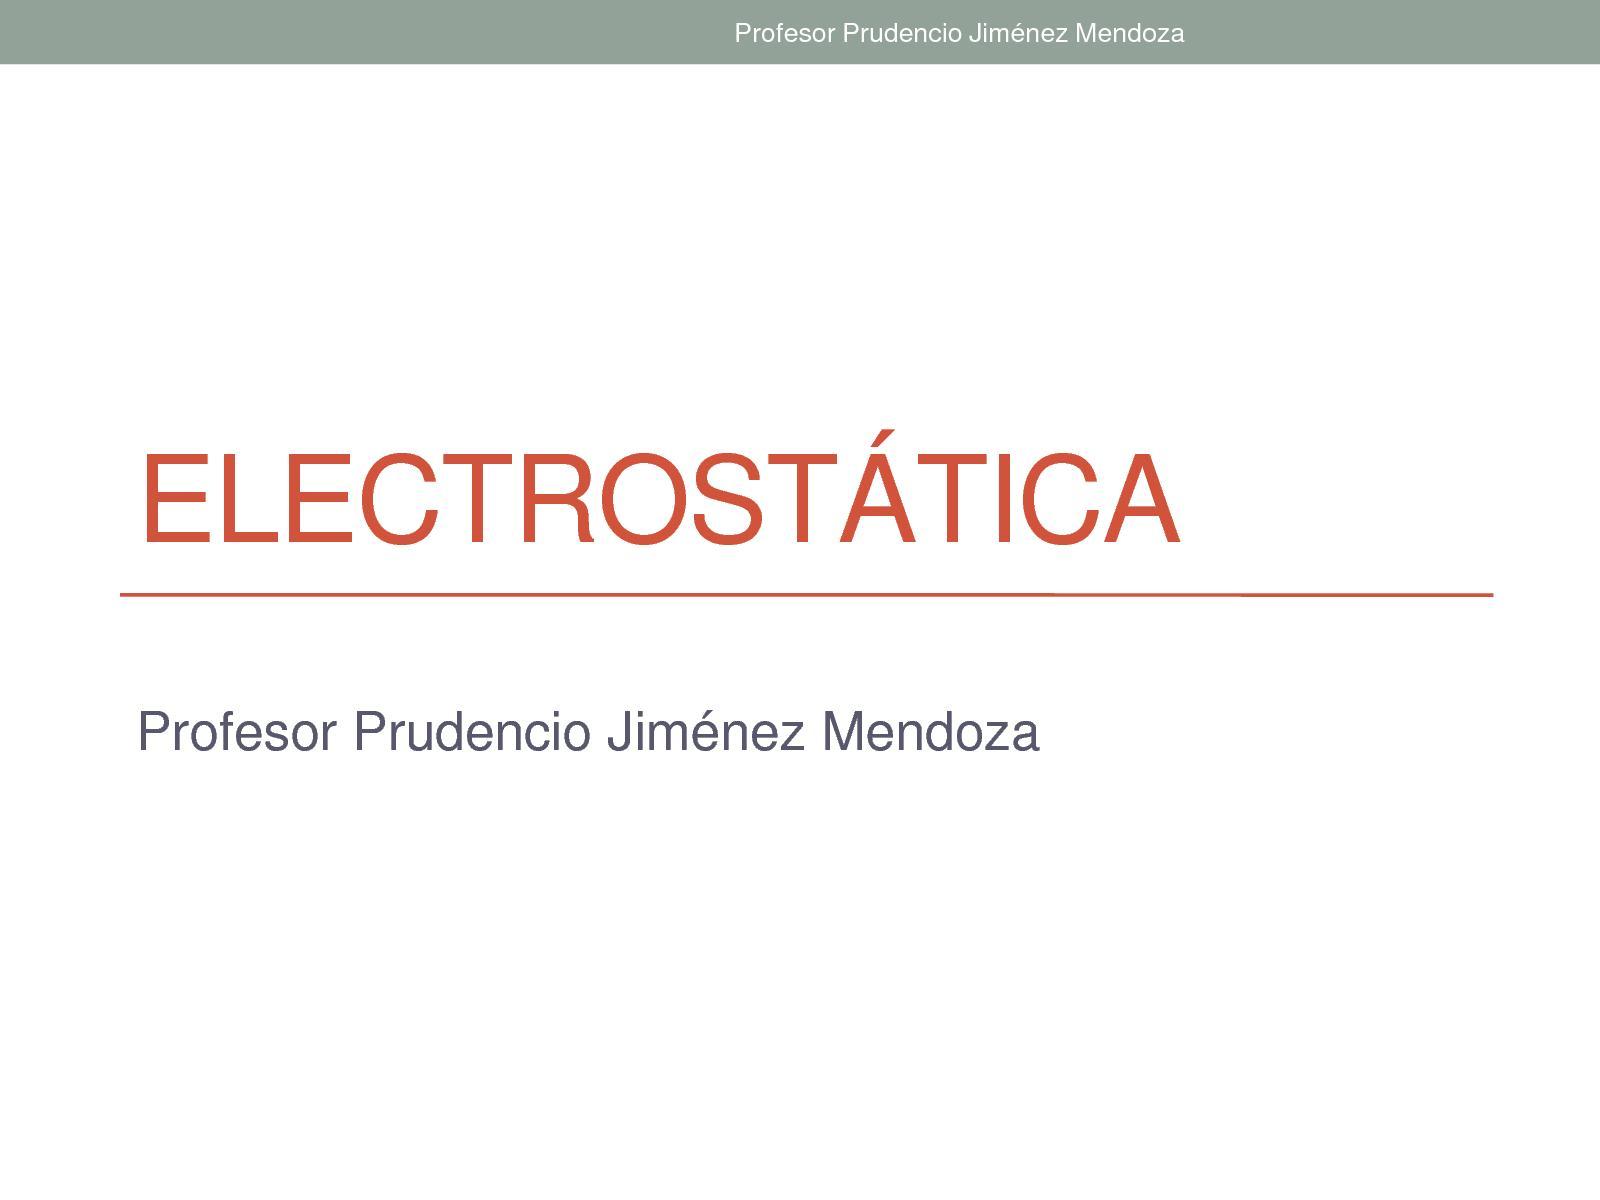 Diapositivas Electrostatica 2017